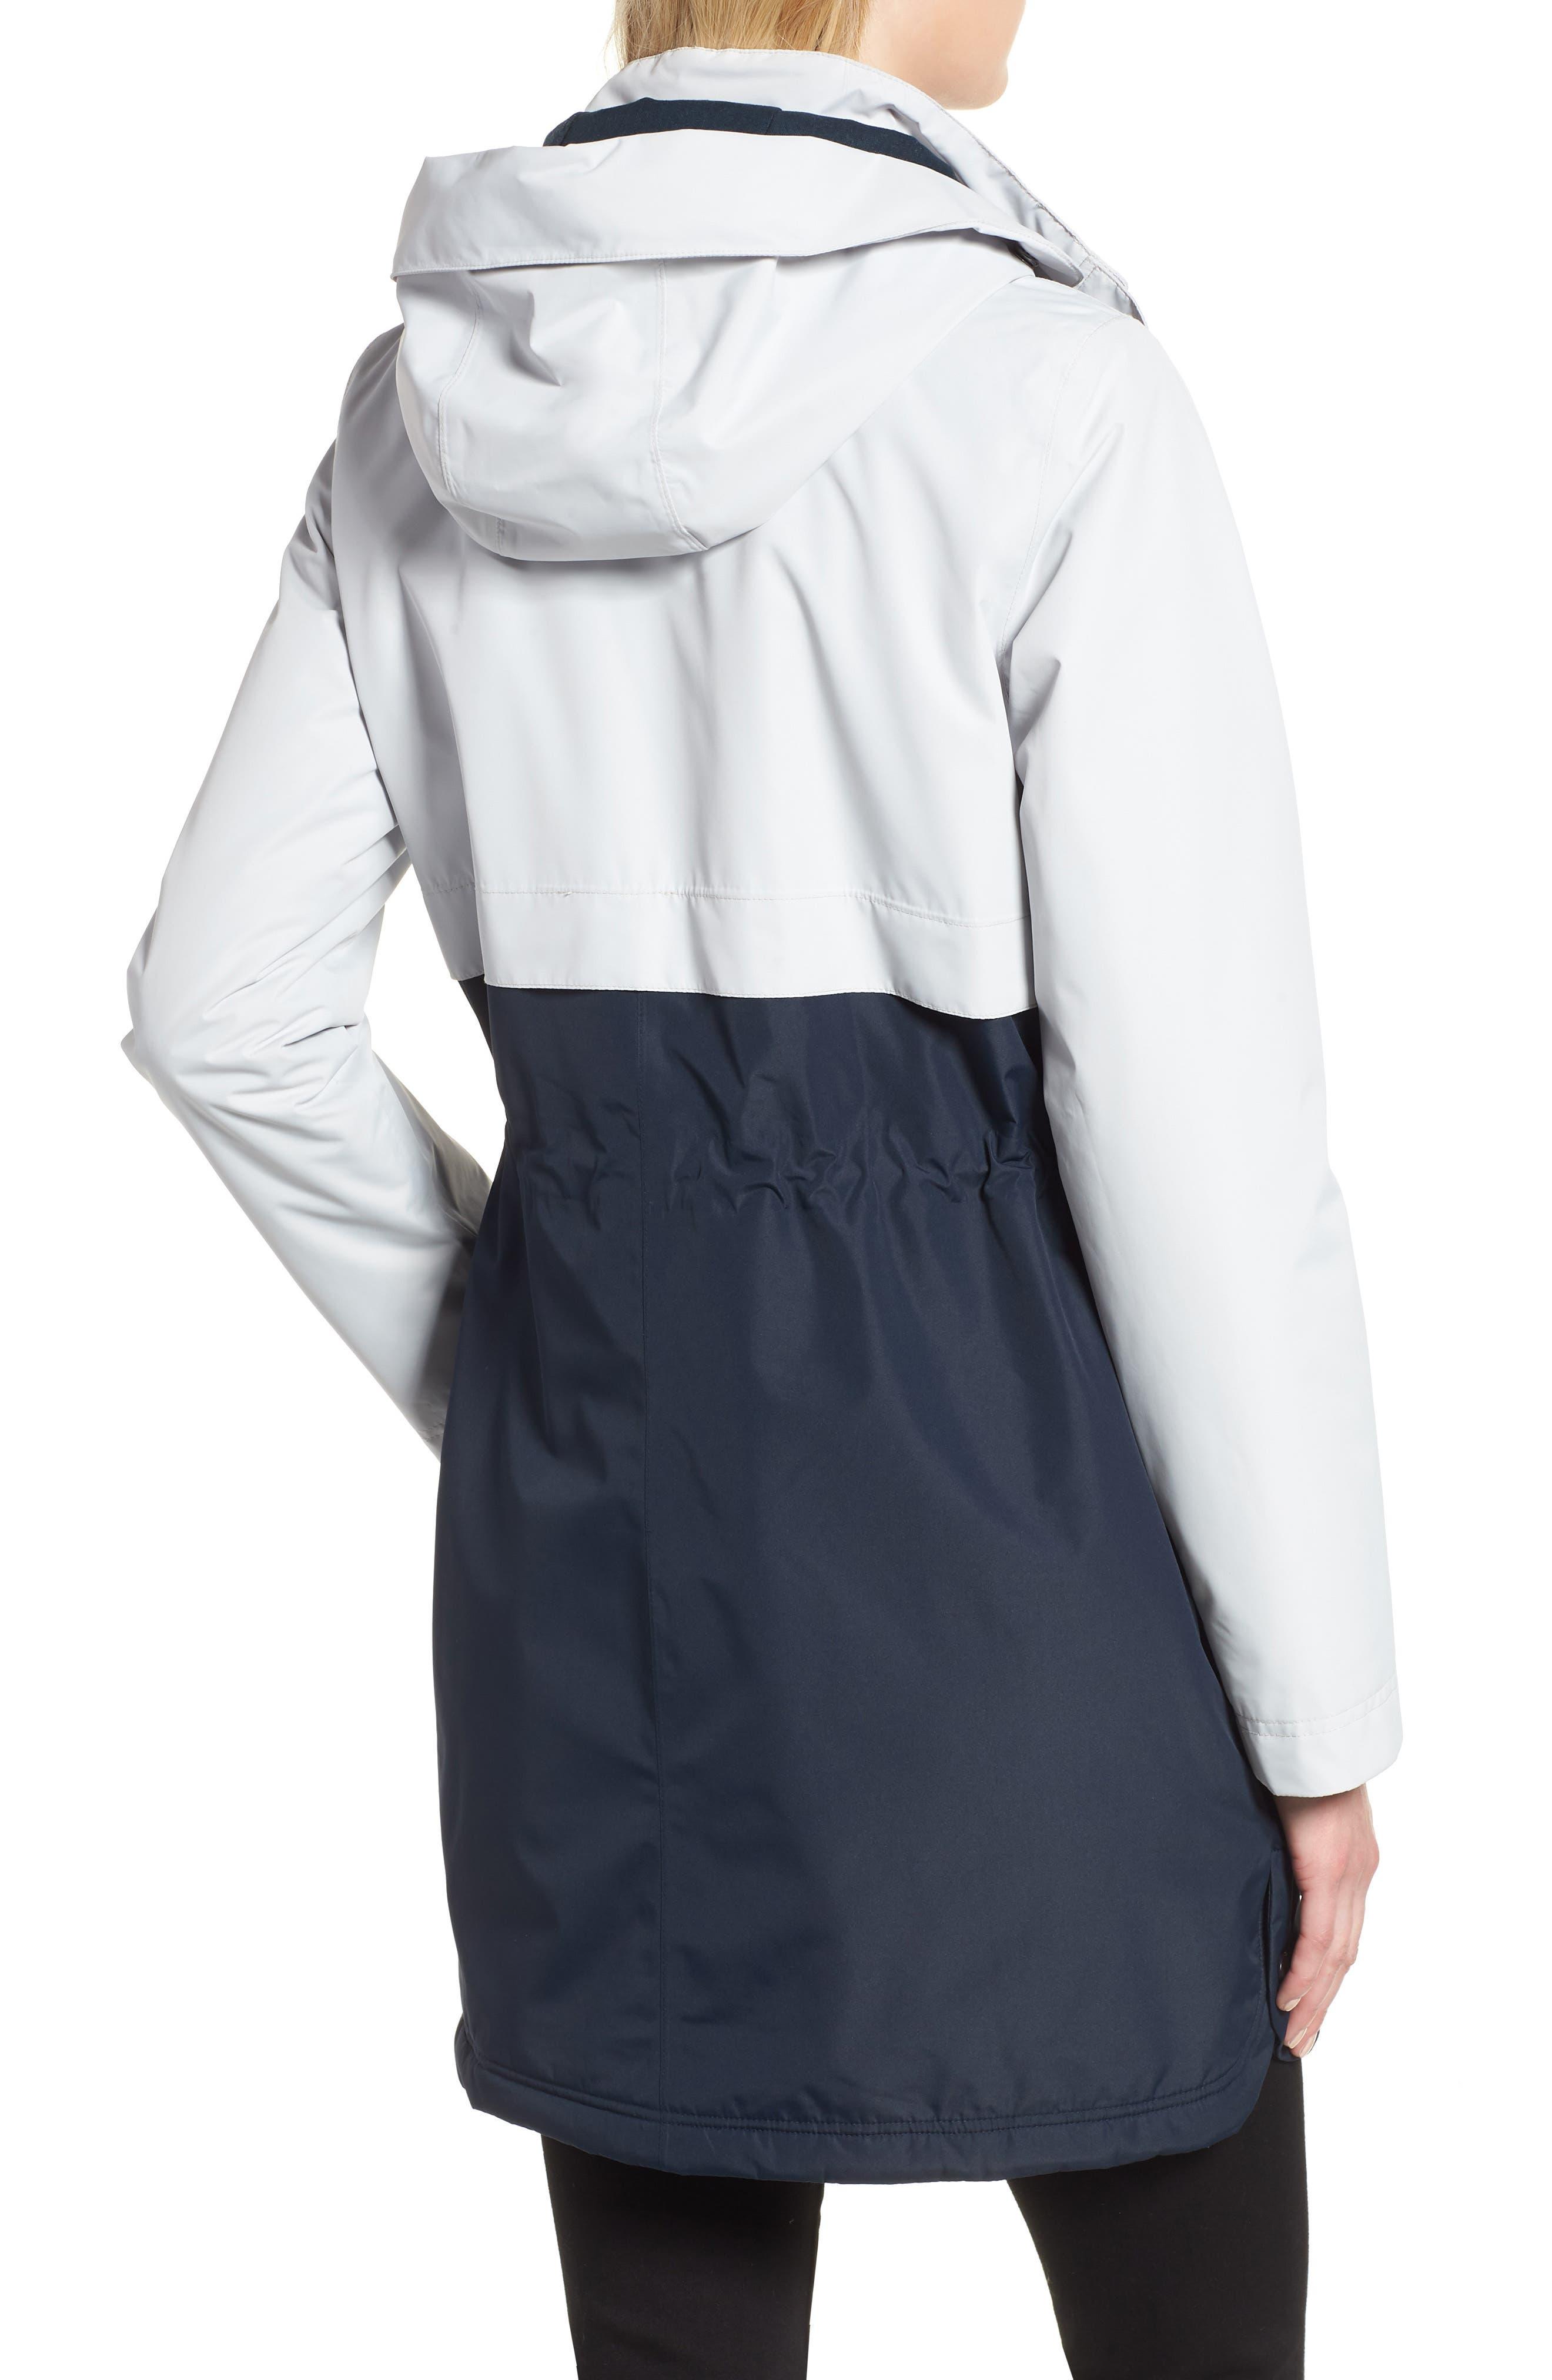 Damini Waterproof Jacket,                             Alternate thumbnail 2, color,                             410